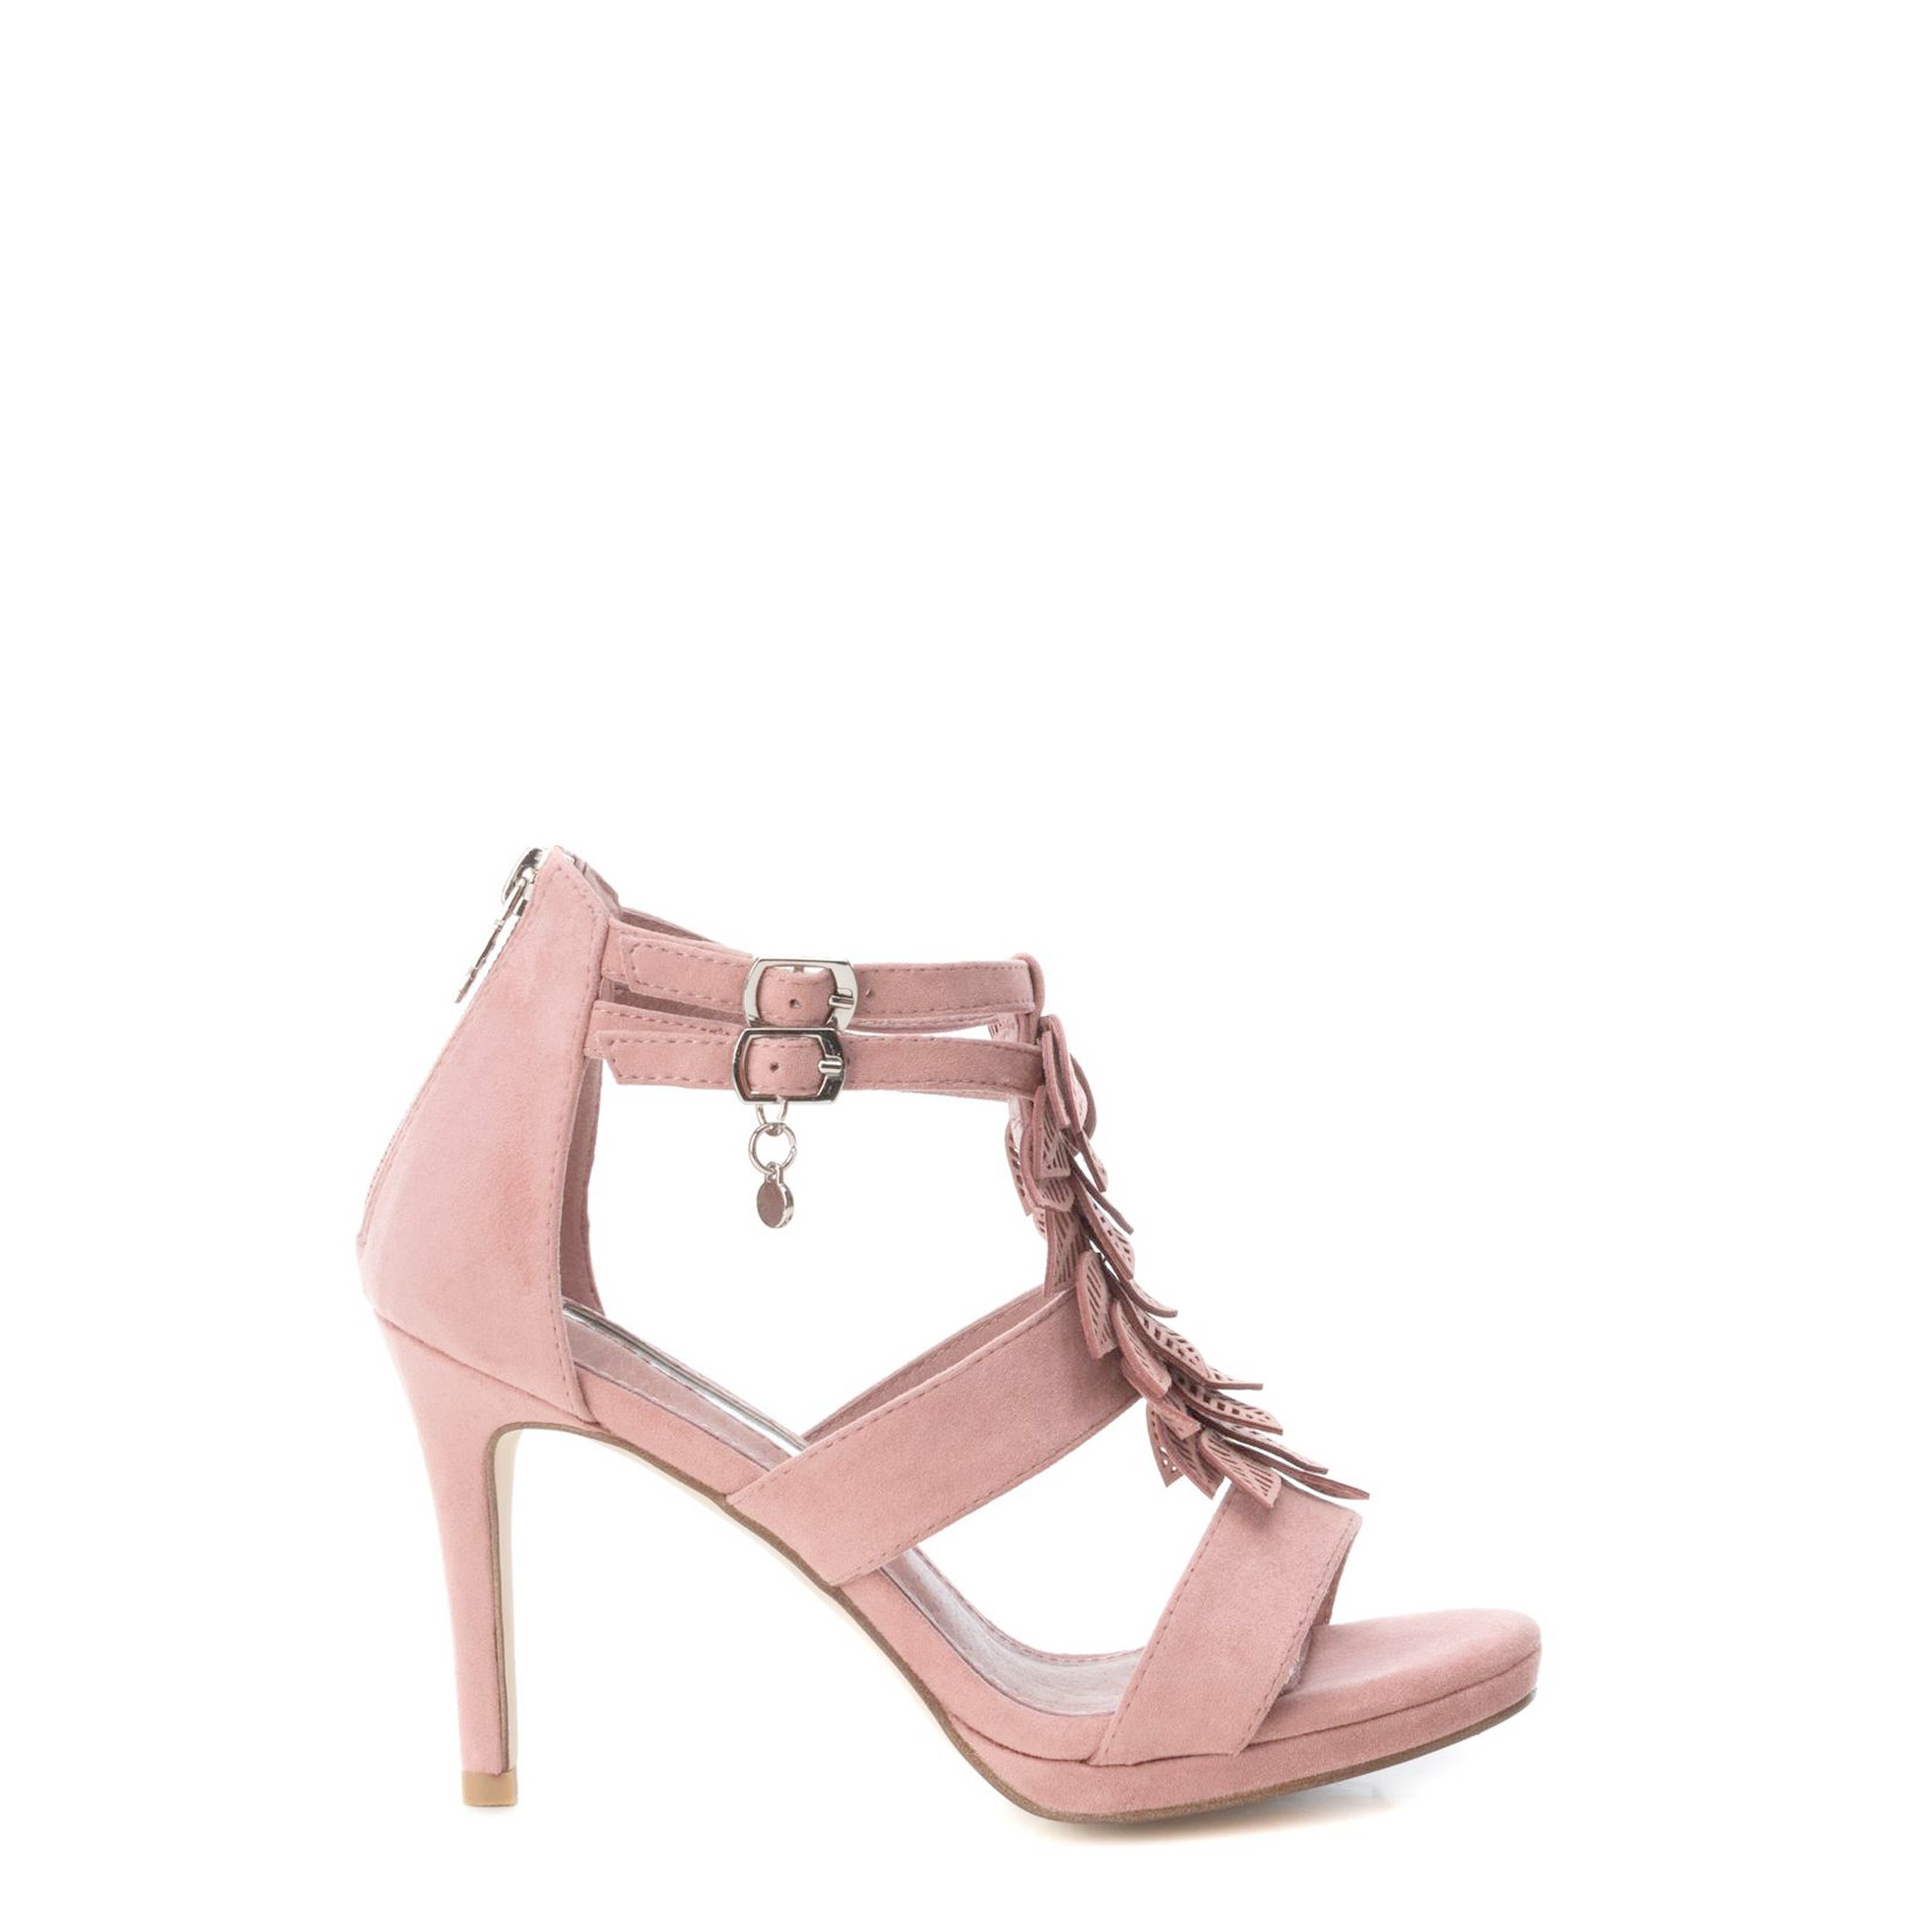 Xti Women's Sandals Various Colors 32077 - pink 36 EU